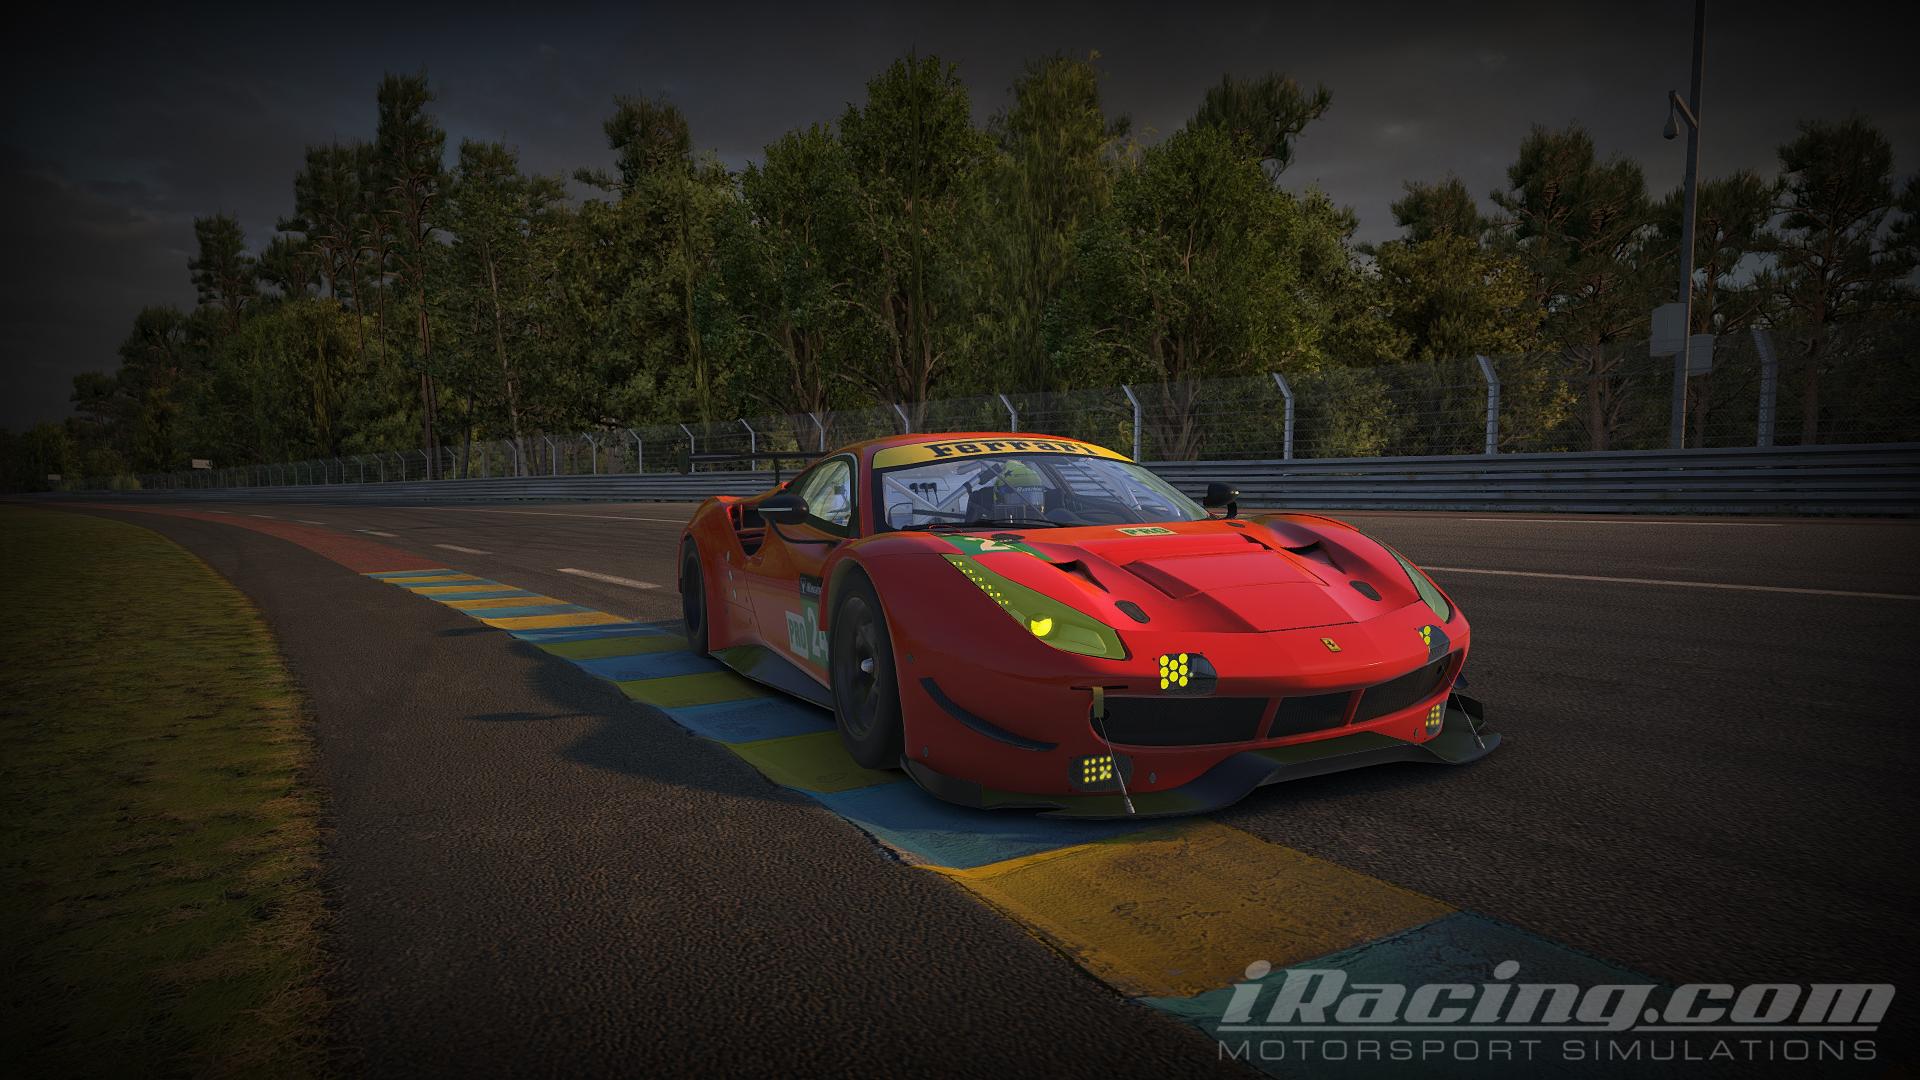 iRacing Ferrari 488 GTE 1